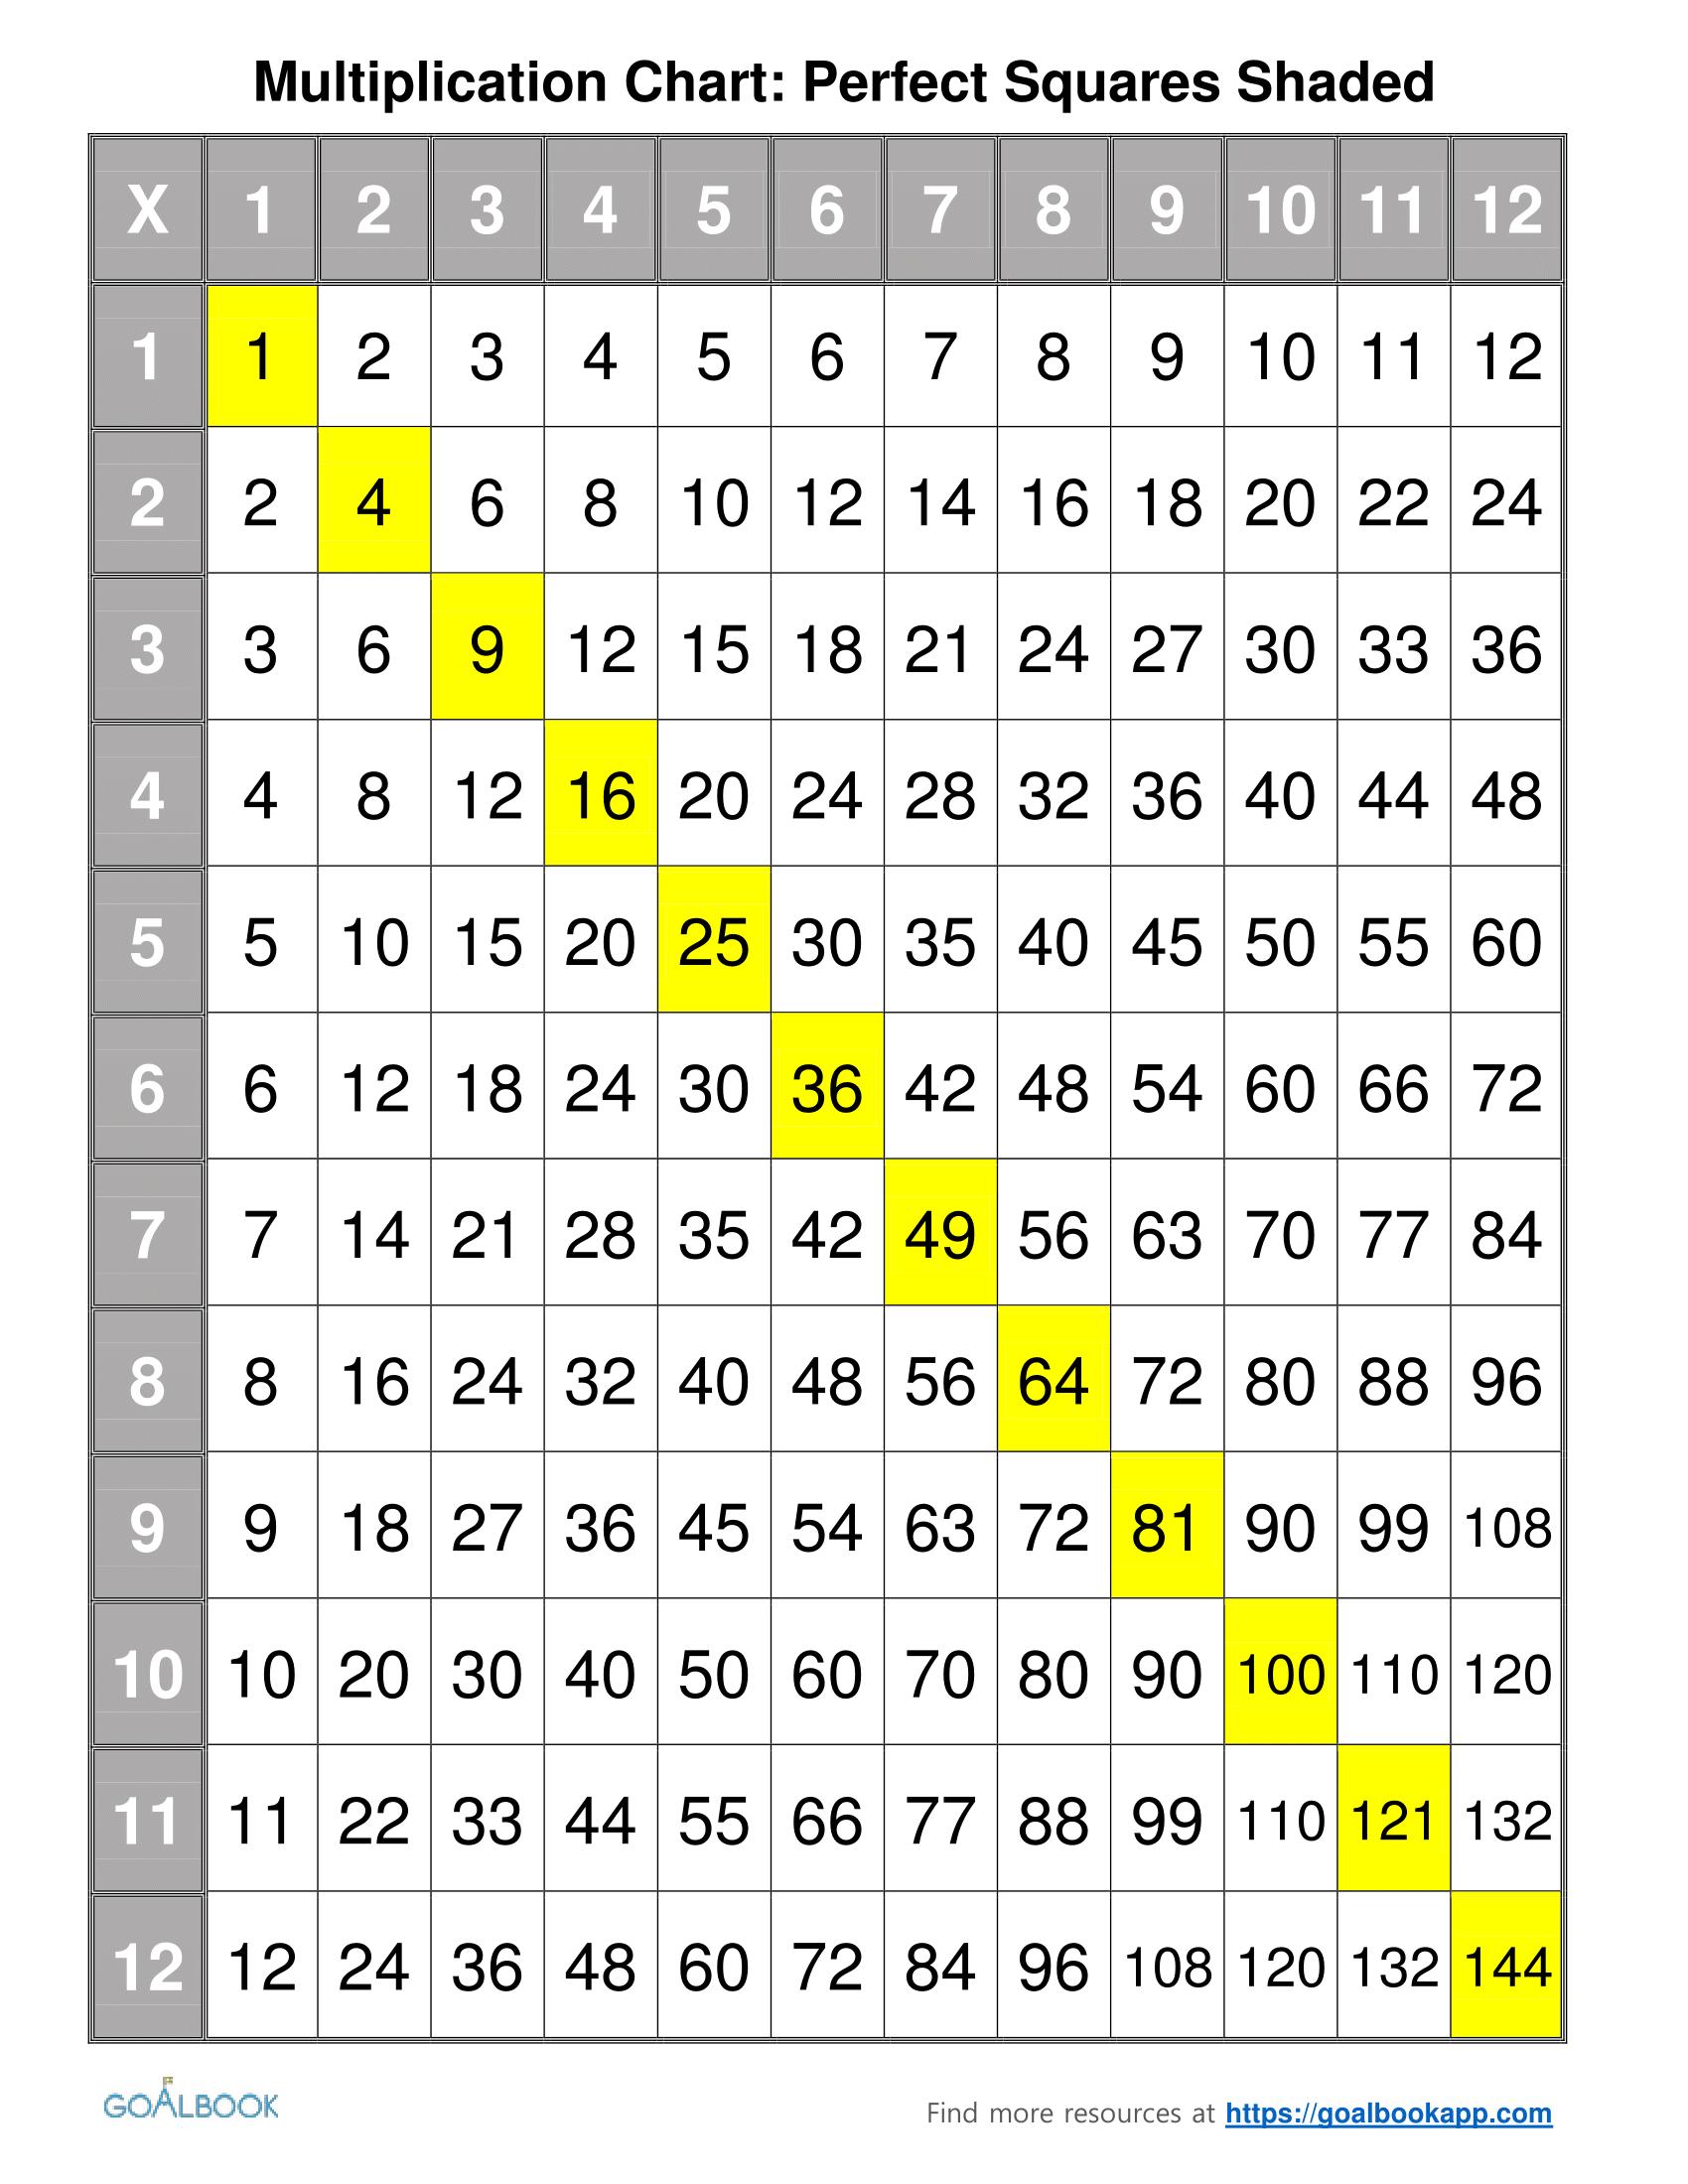 Multiplication Chart | Udl Strategies - Goalbook Toolkit